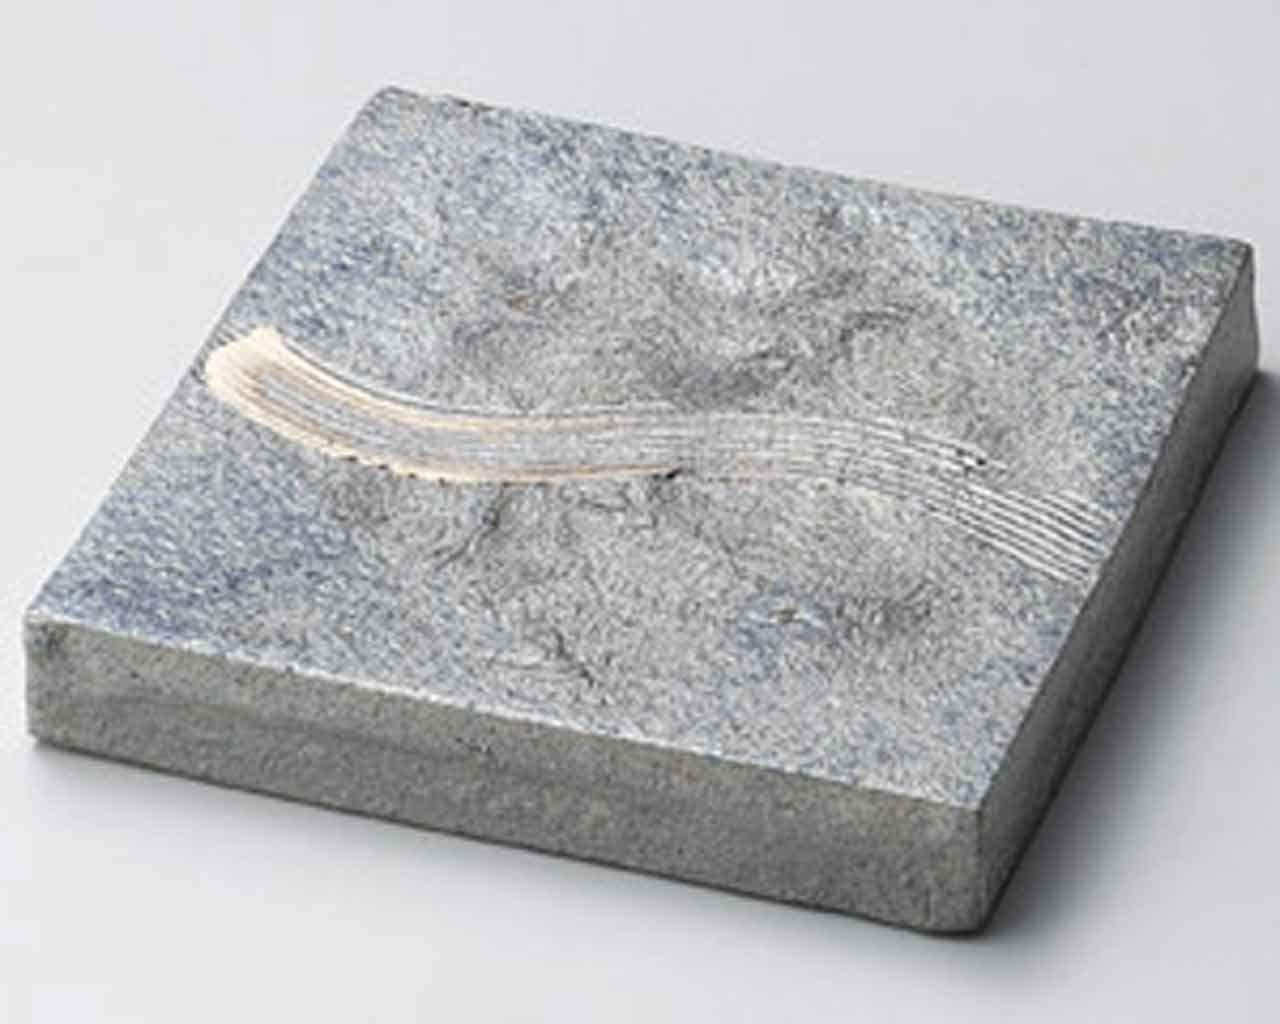 Yohen Kushime 8.1inch Medium Plate Grey Ceramic Made in Japan